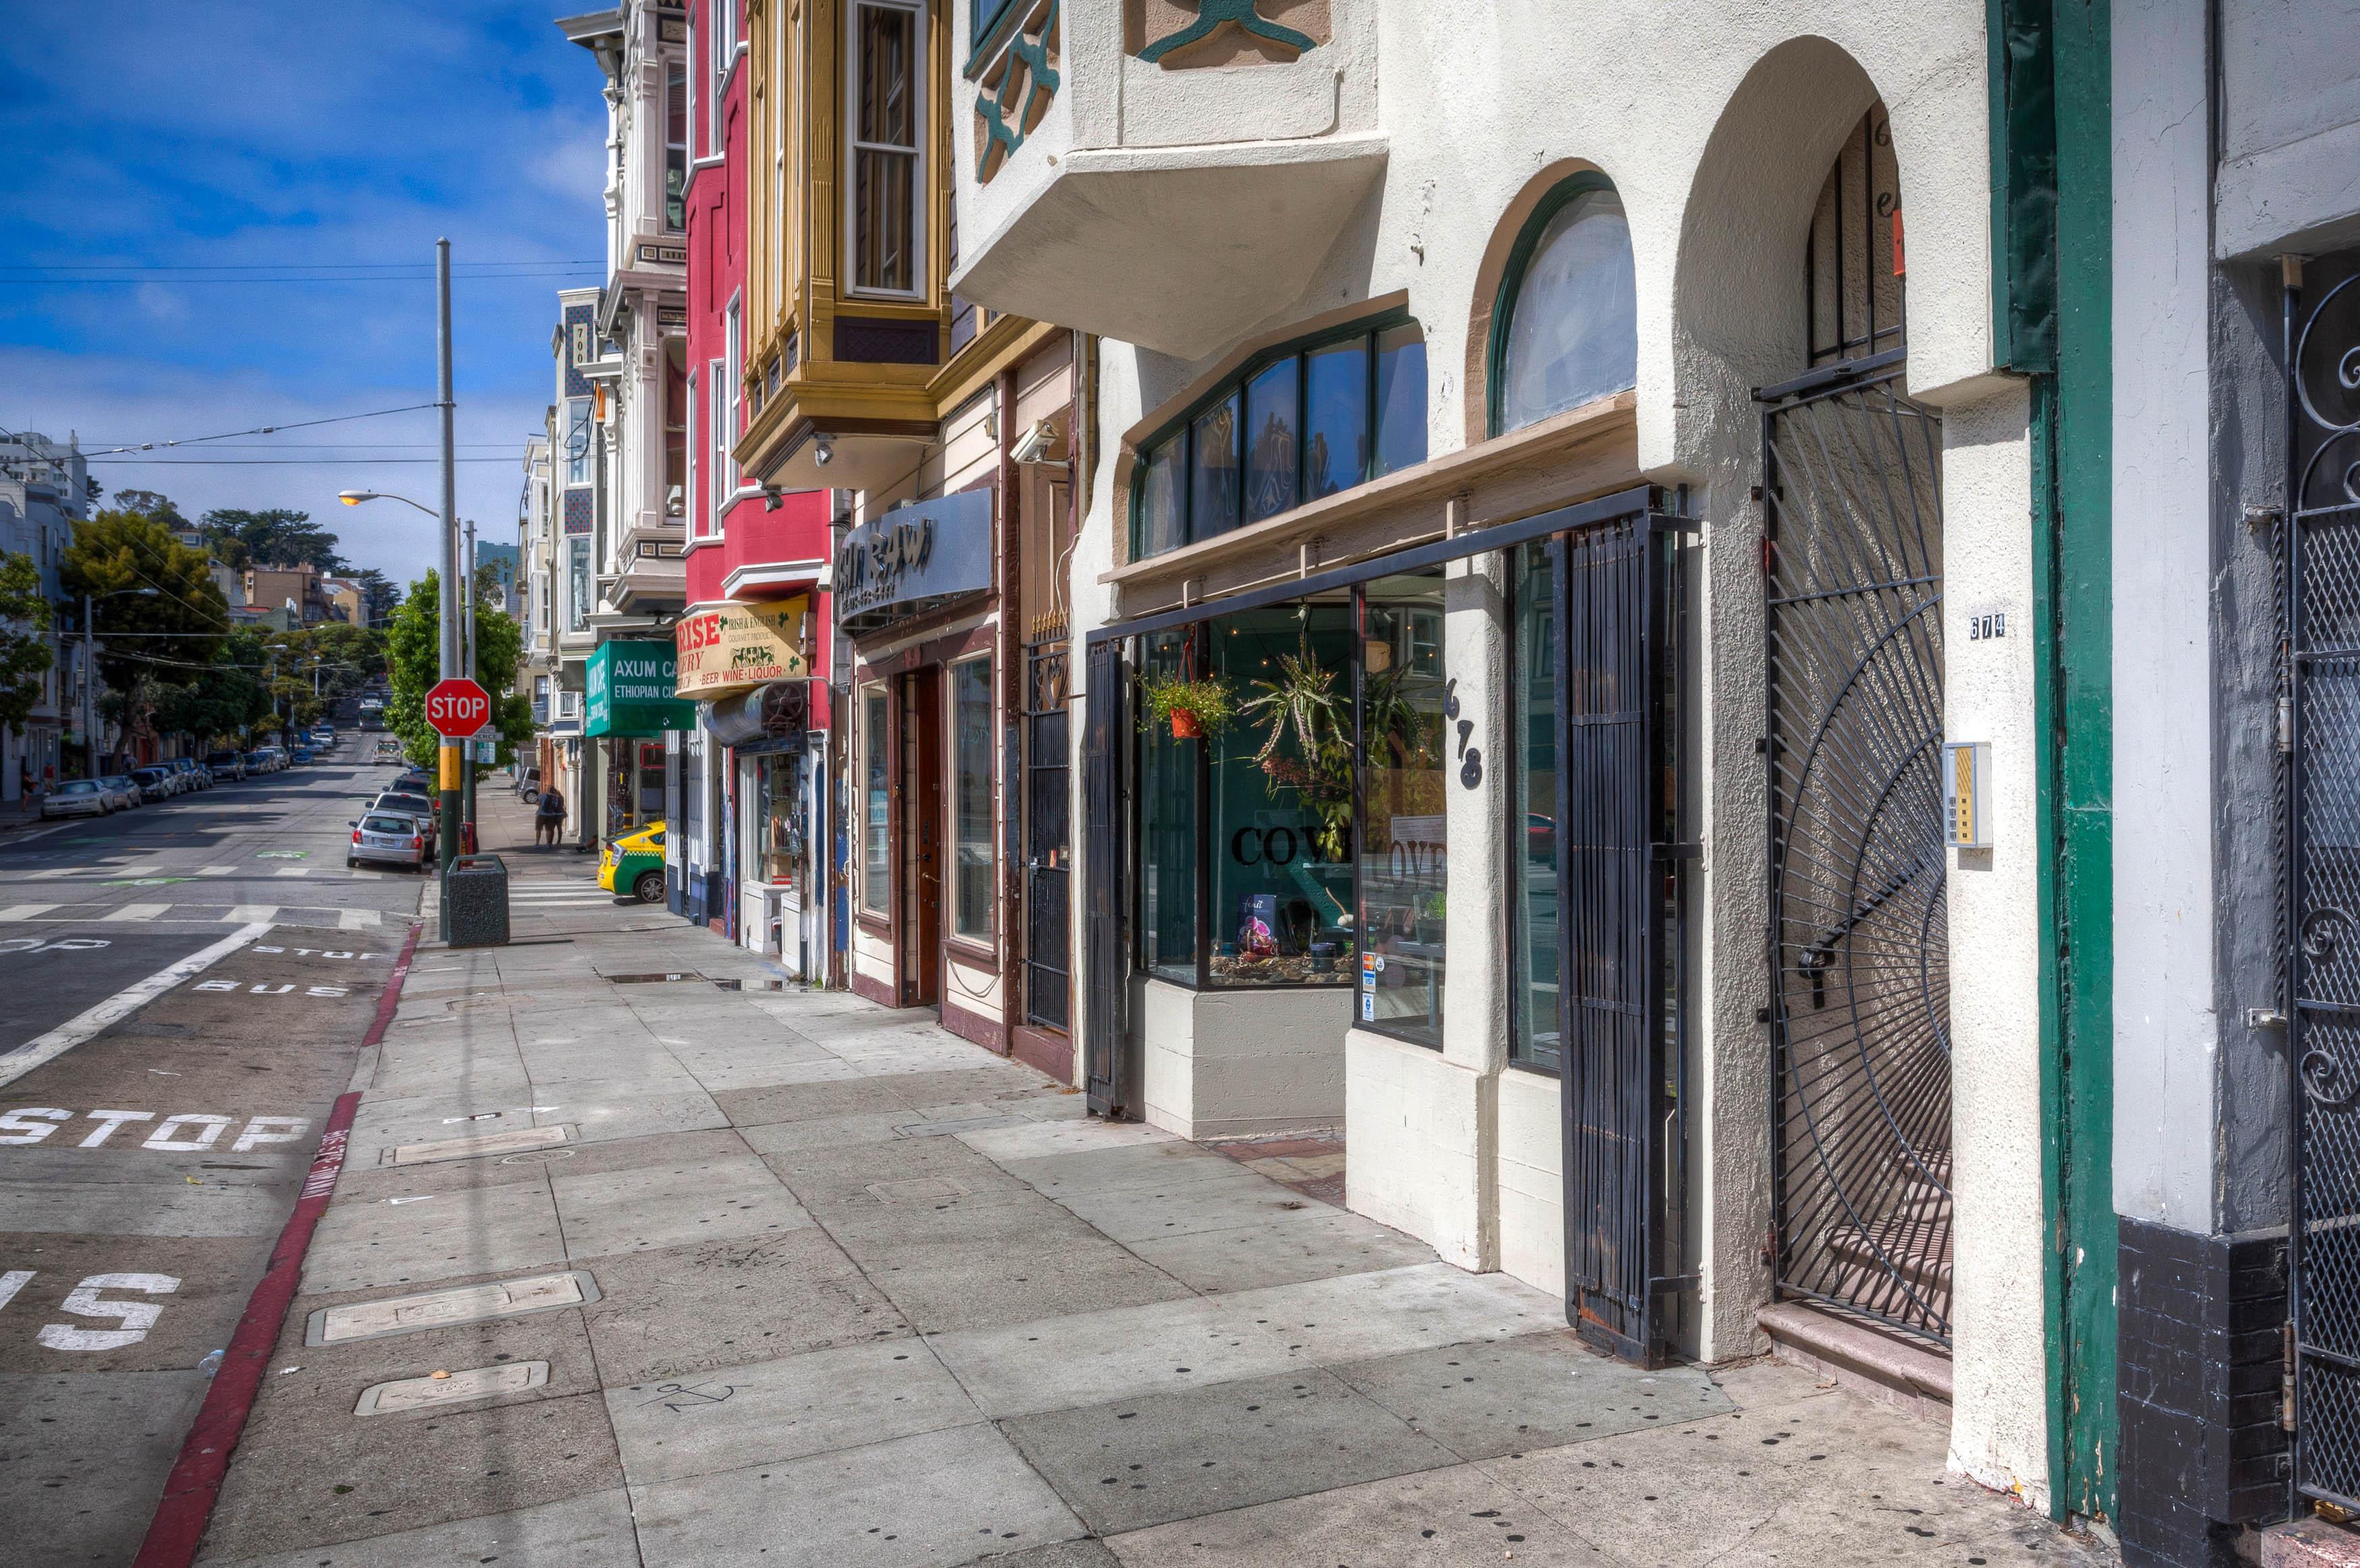 674 Haight St, San Francisco